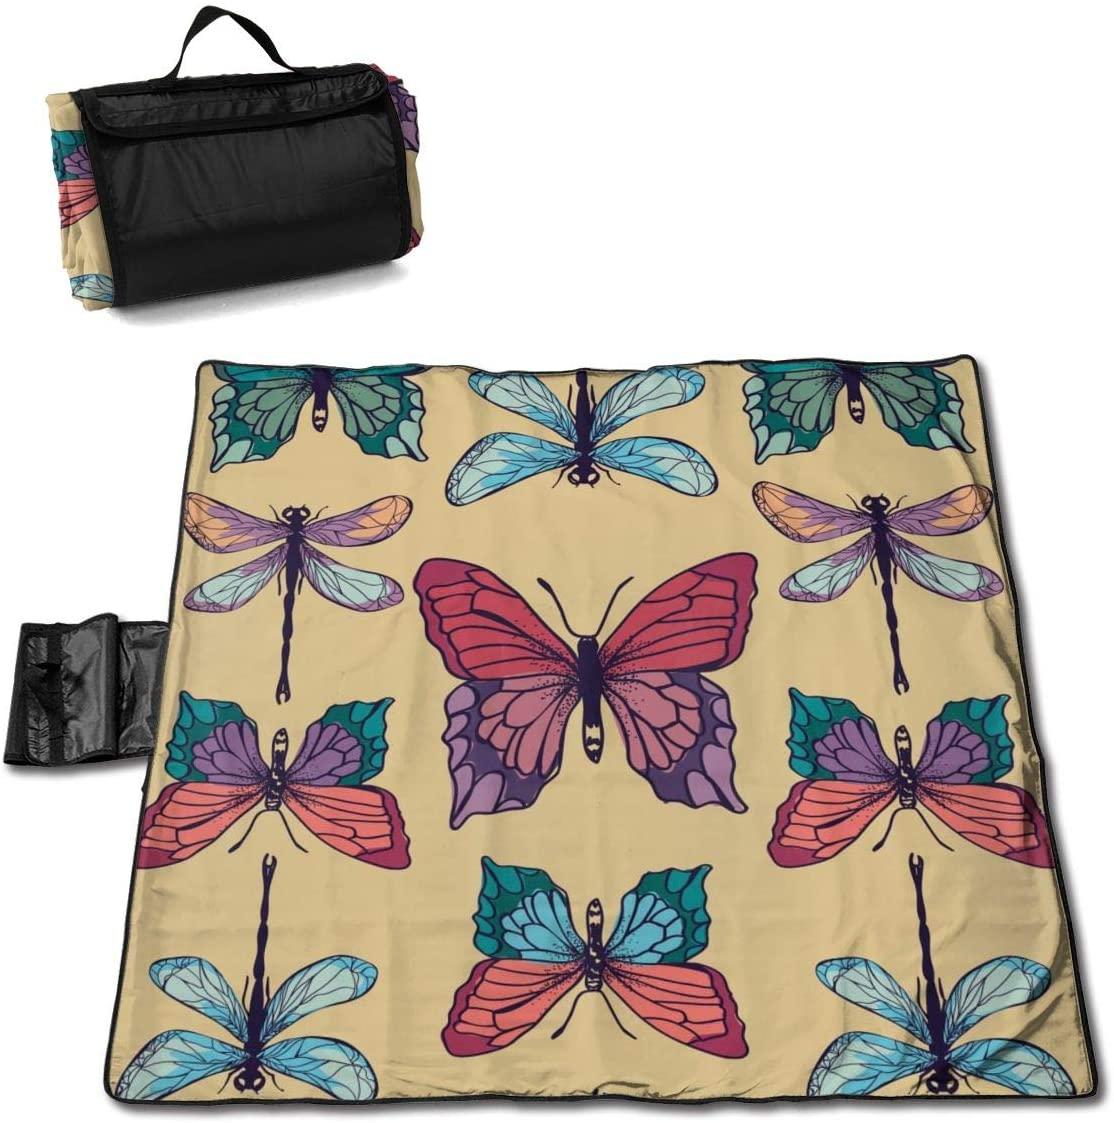 HONGSH Outdoor Picnic Blanket,Beach Blanket, Butterflies Dragonflies Beach Mat, Waterproof Sandproof Foldable Picnic Mat, Portable Outdoor Beach Blanket for Beaches,Camping,Hiking Picnic